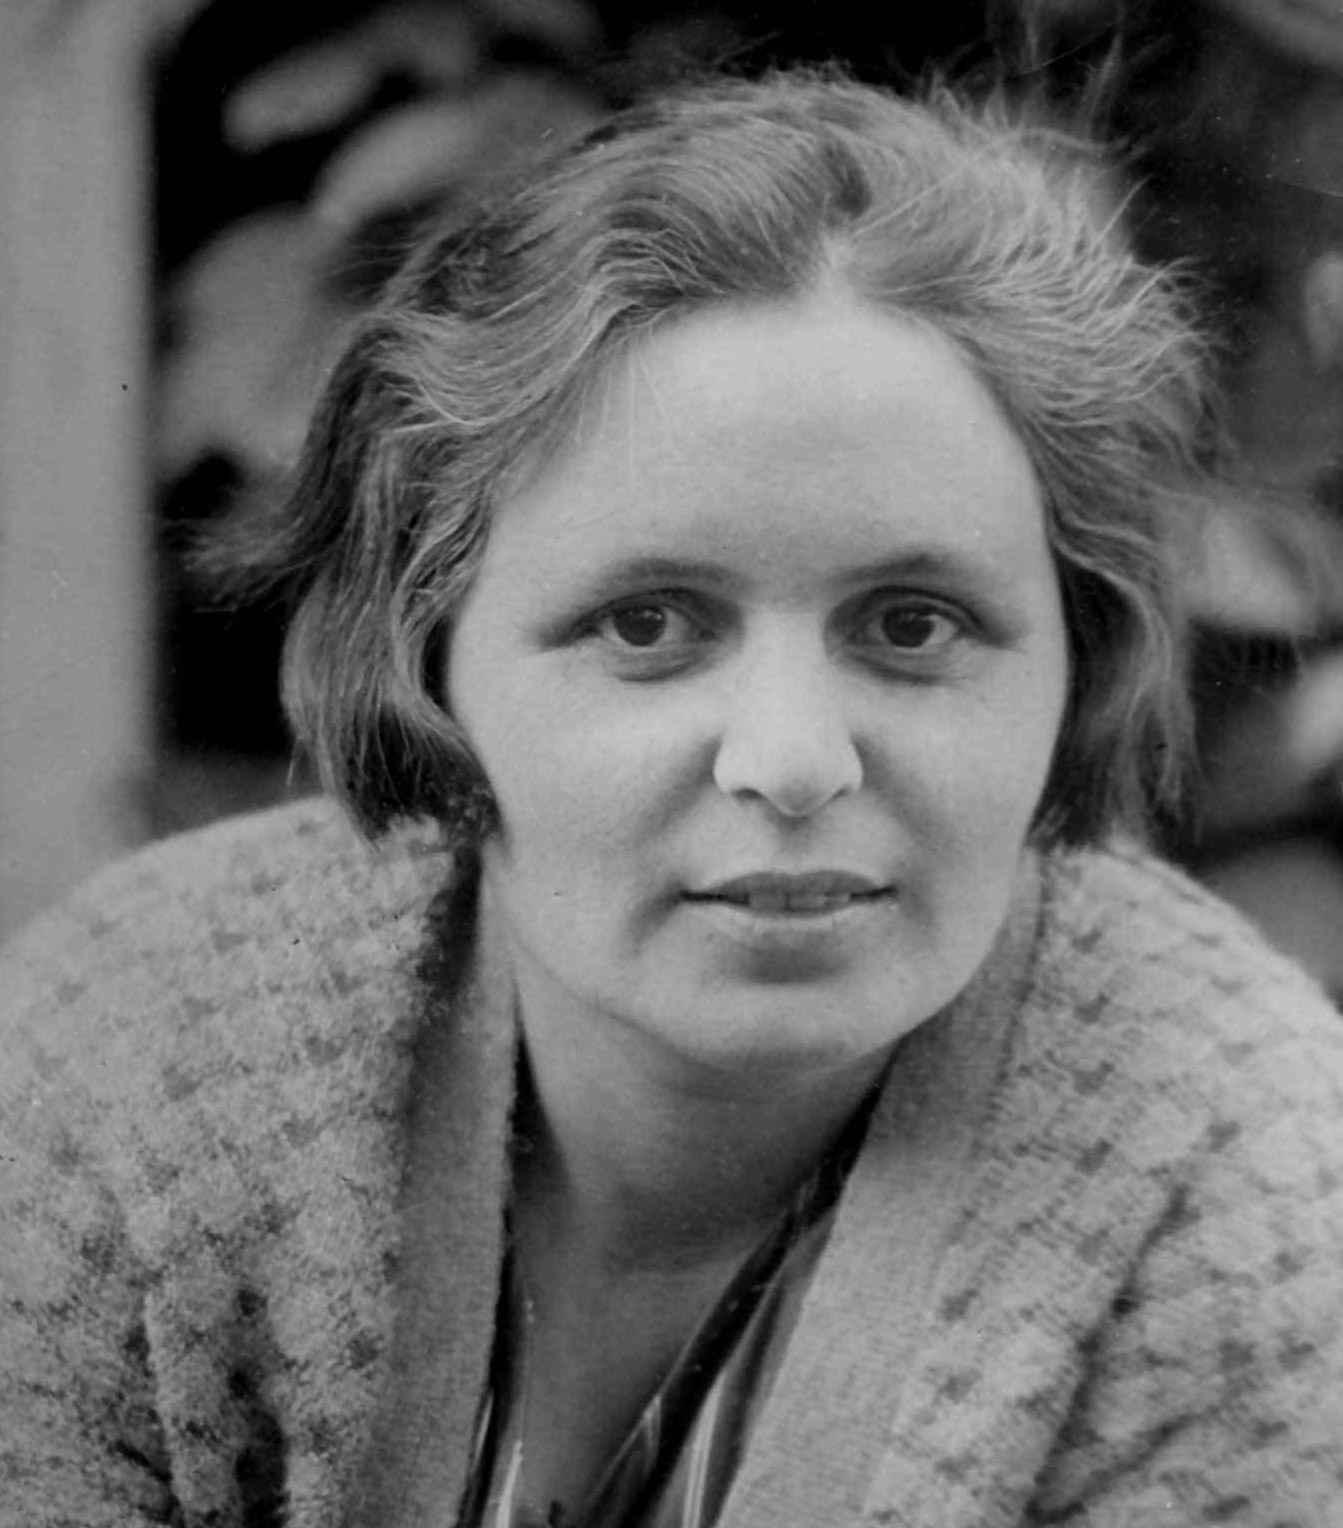 Экспонат #18. Мария Суреновна Спандарьян (1902 — 1945)